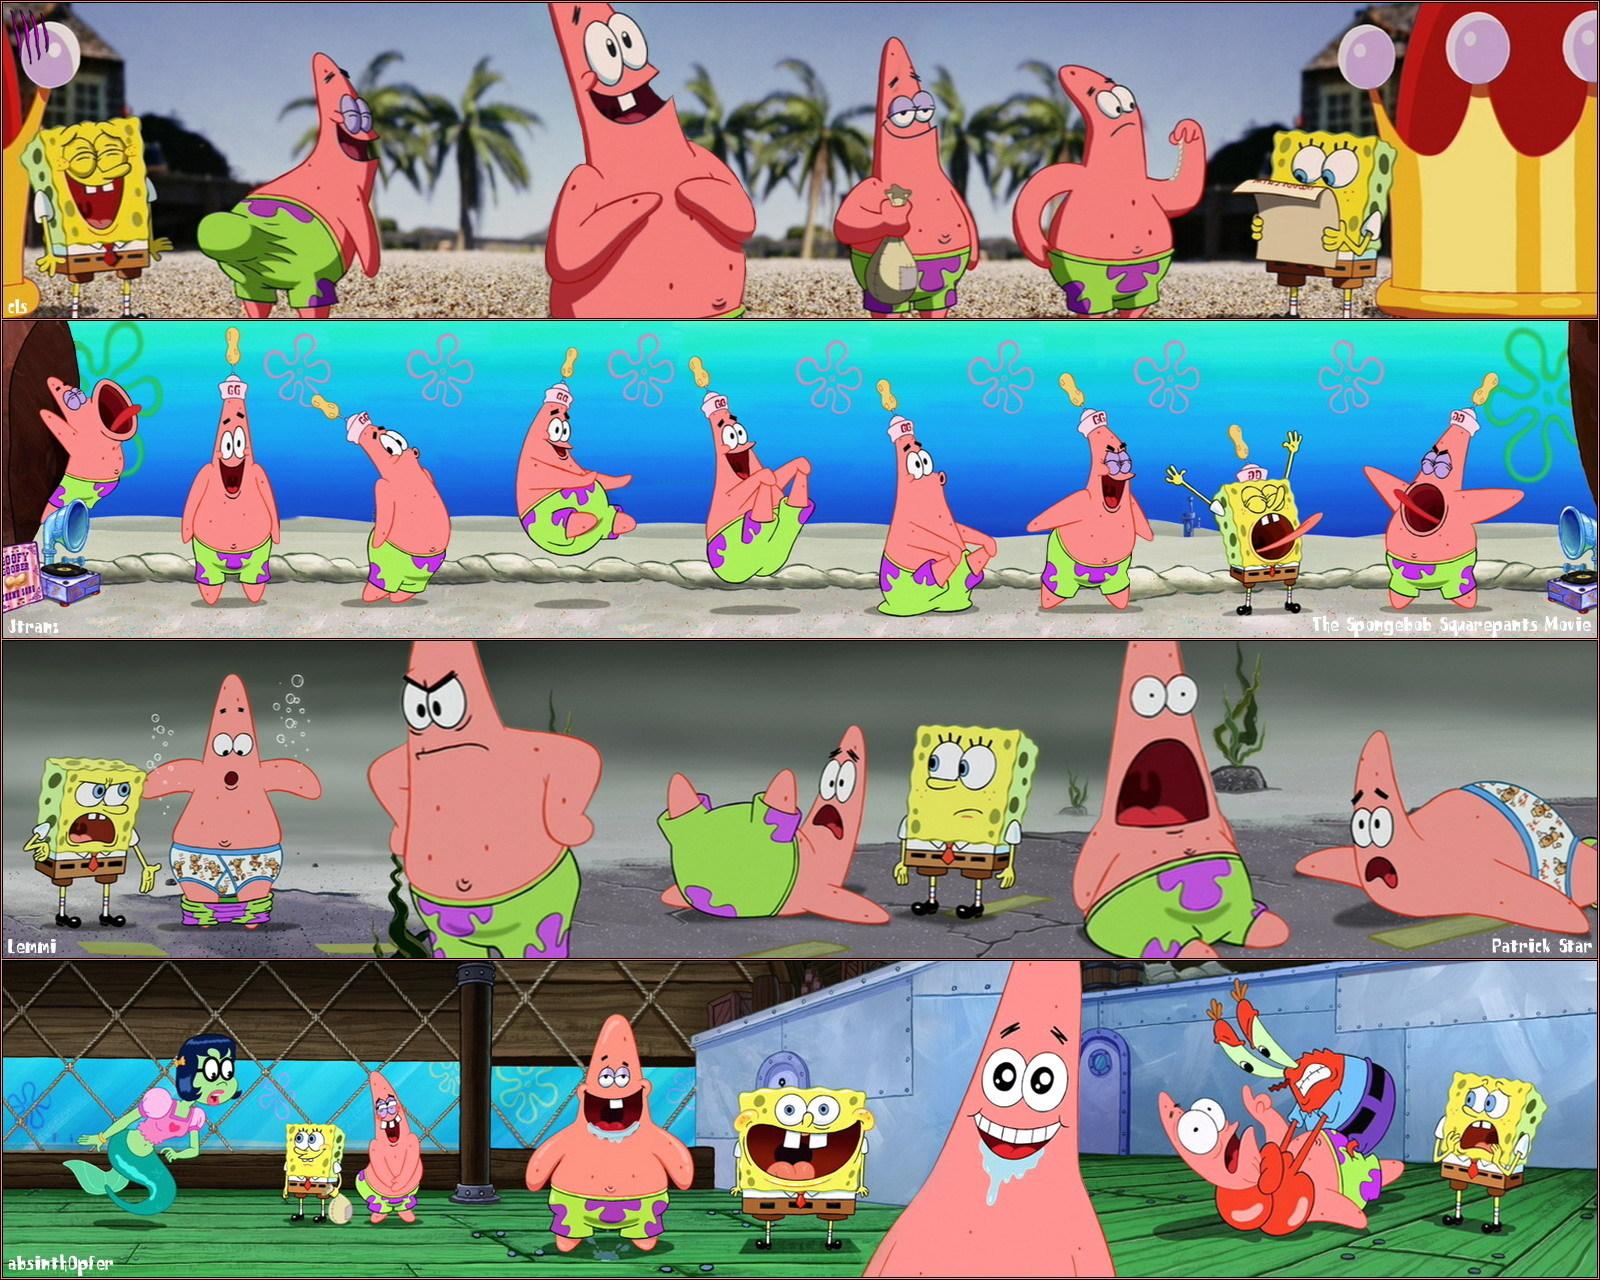 Patrick wallpapers patrick star spongebob 2746173 1600 1280